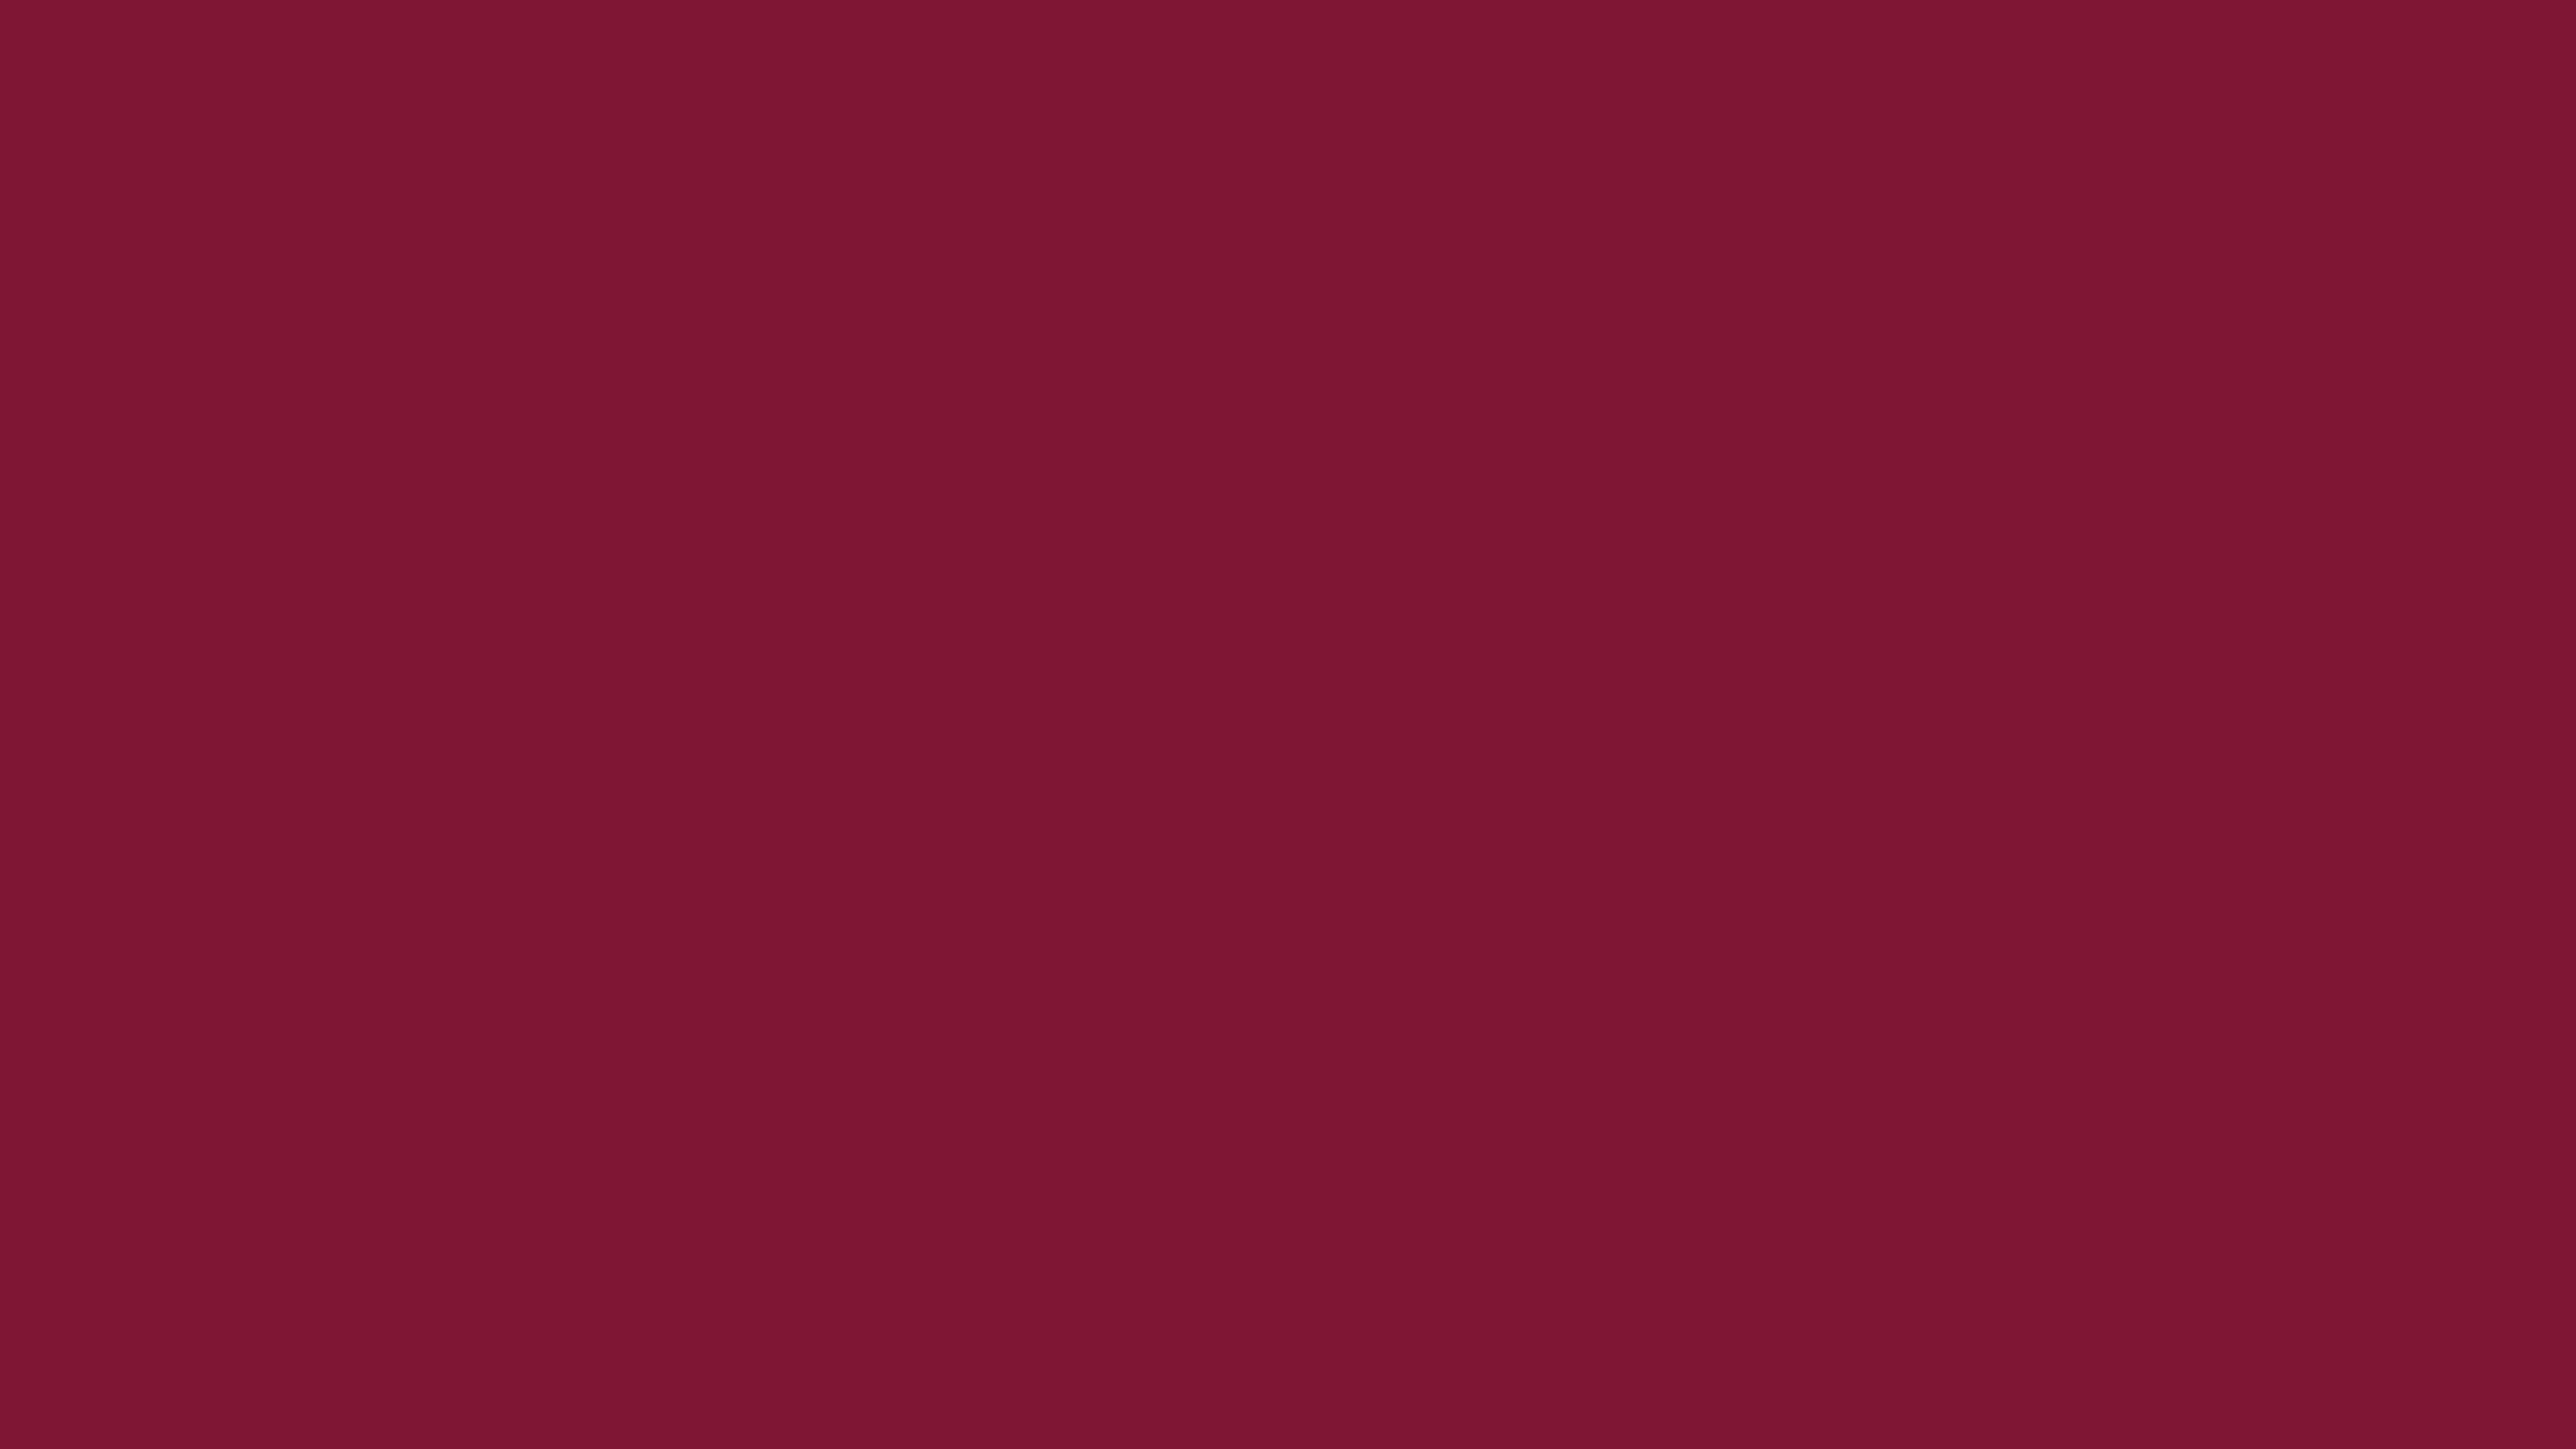 7680x4320 Claret Solid Color Background